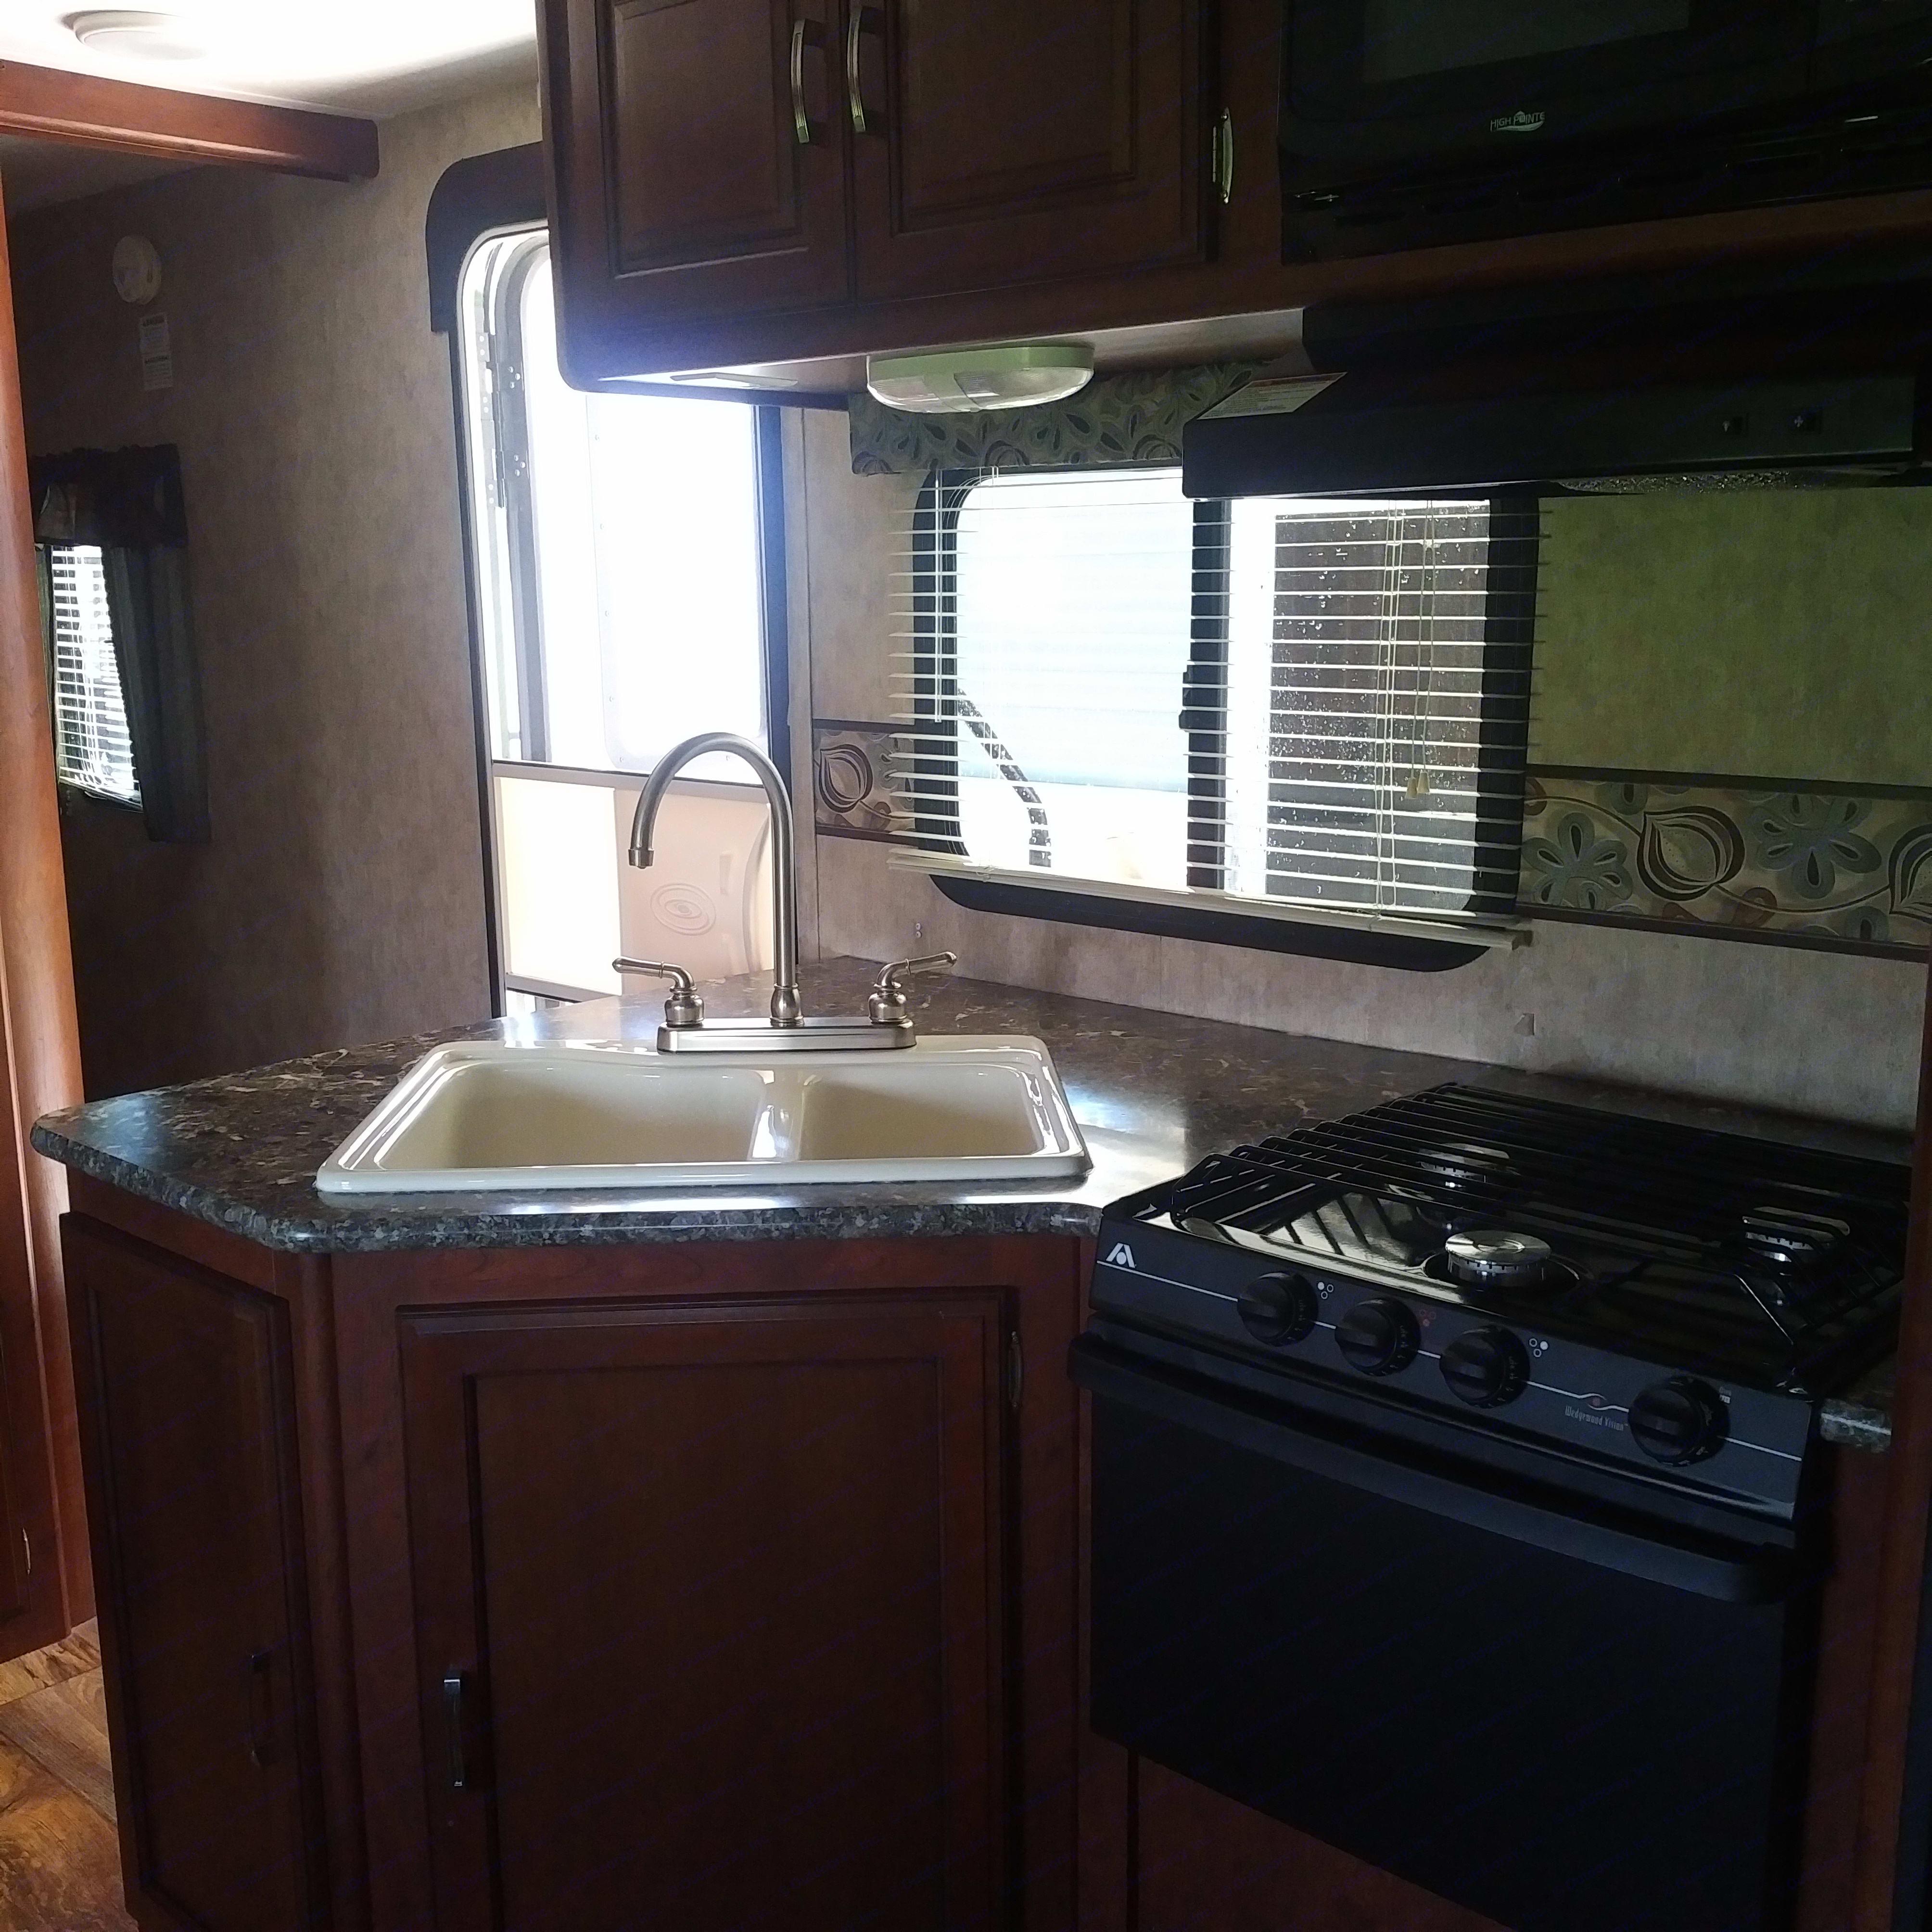 kitchen has dbl sink, stove, oven, microwave, larger fridge and freezer. Keystone Passport 2015